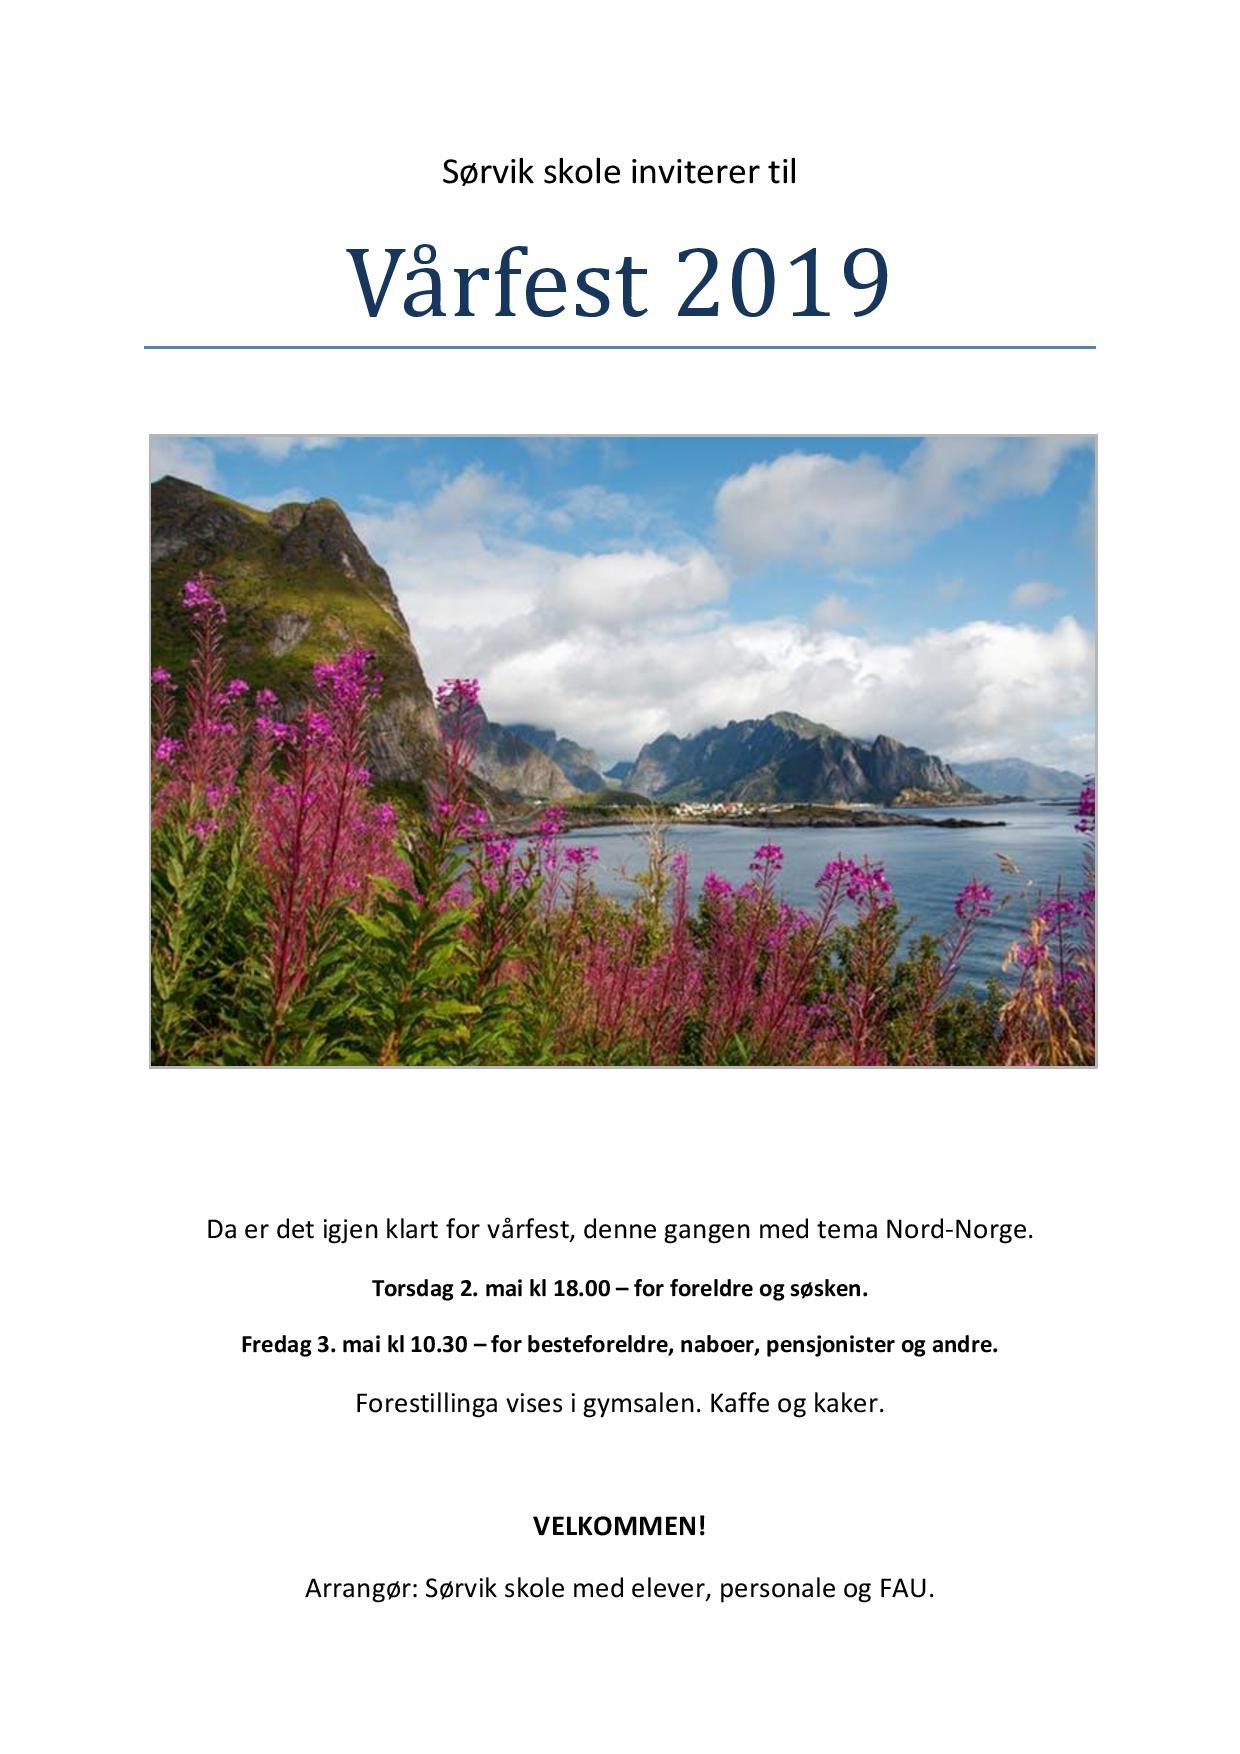 Vårfest 2019-page-001.jpg